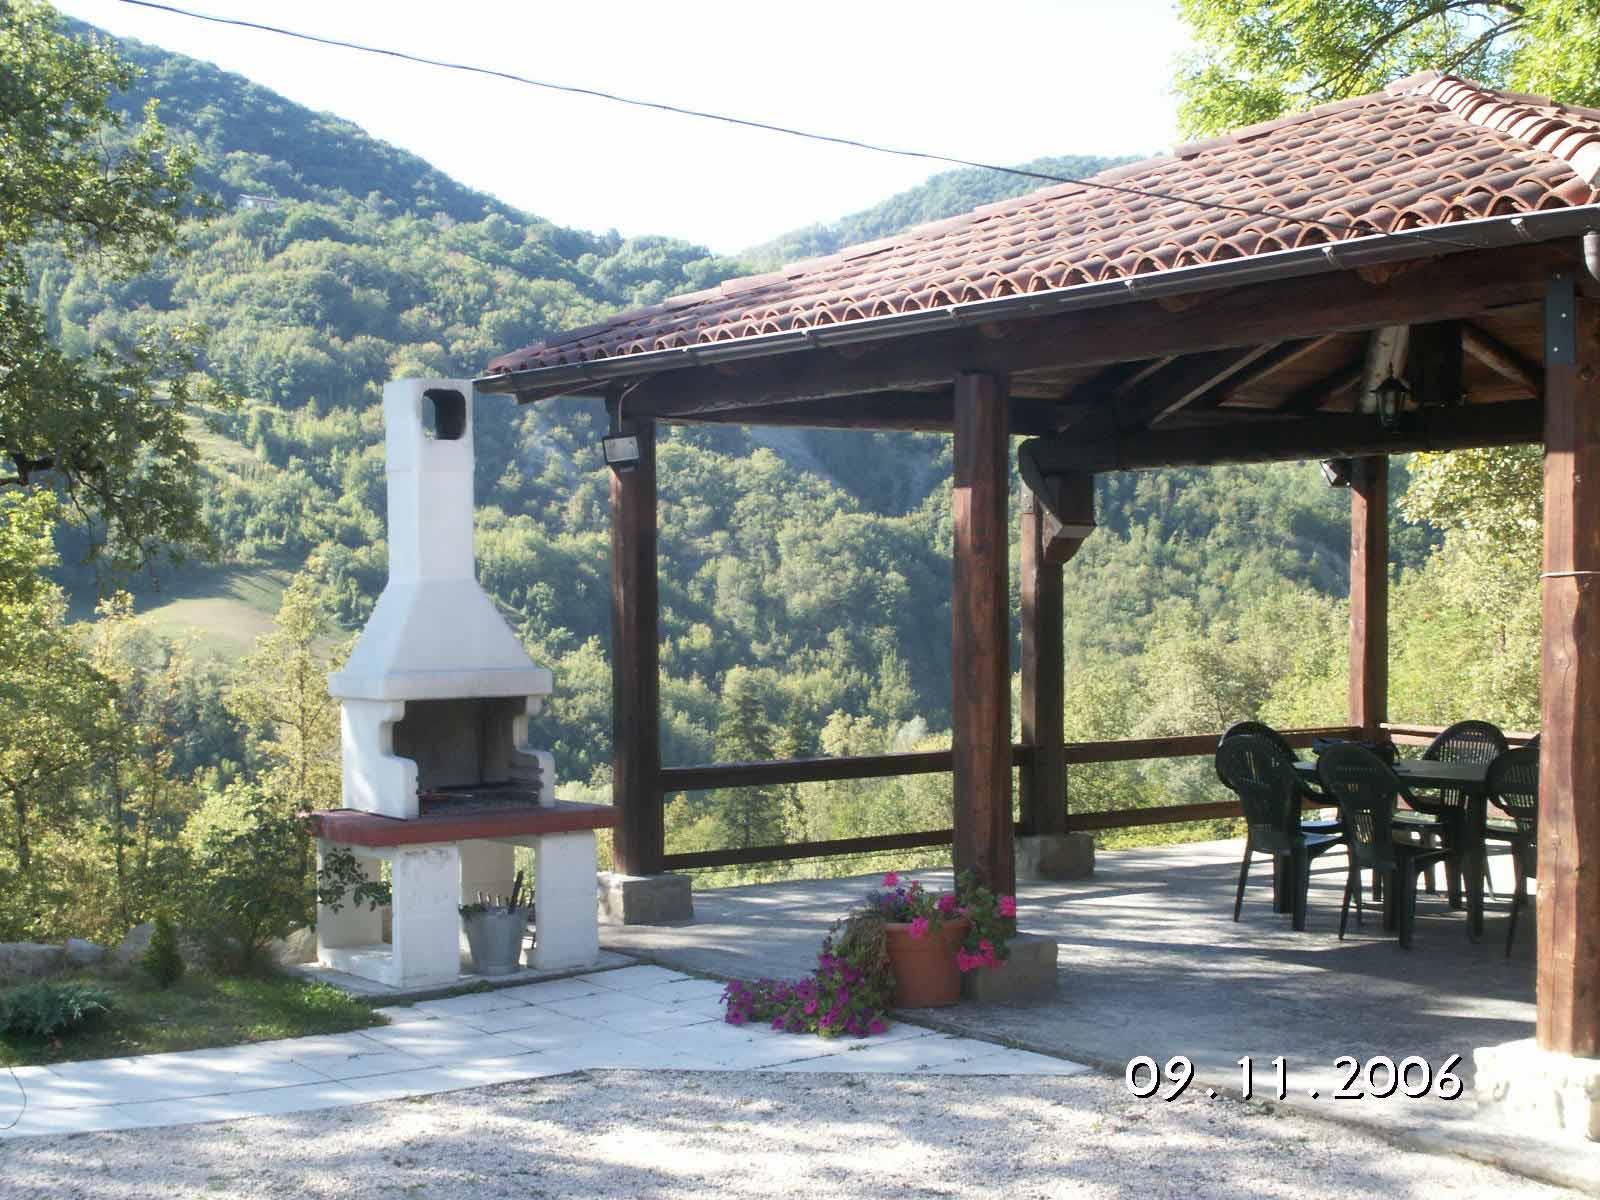 Affitto casa vacanze montagna castel d'aiano